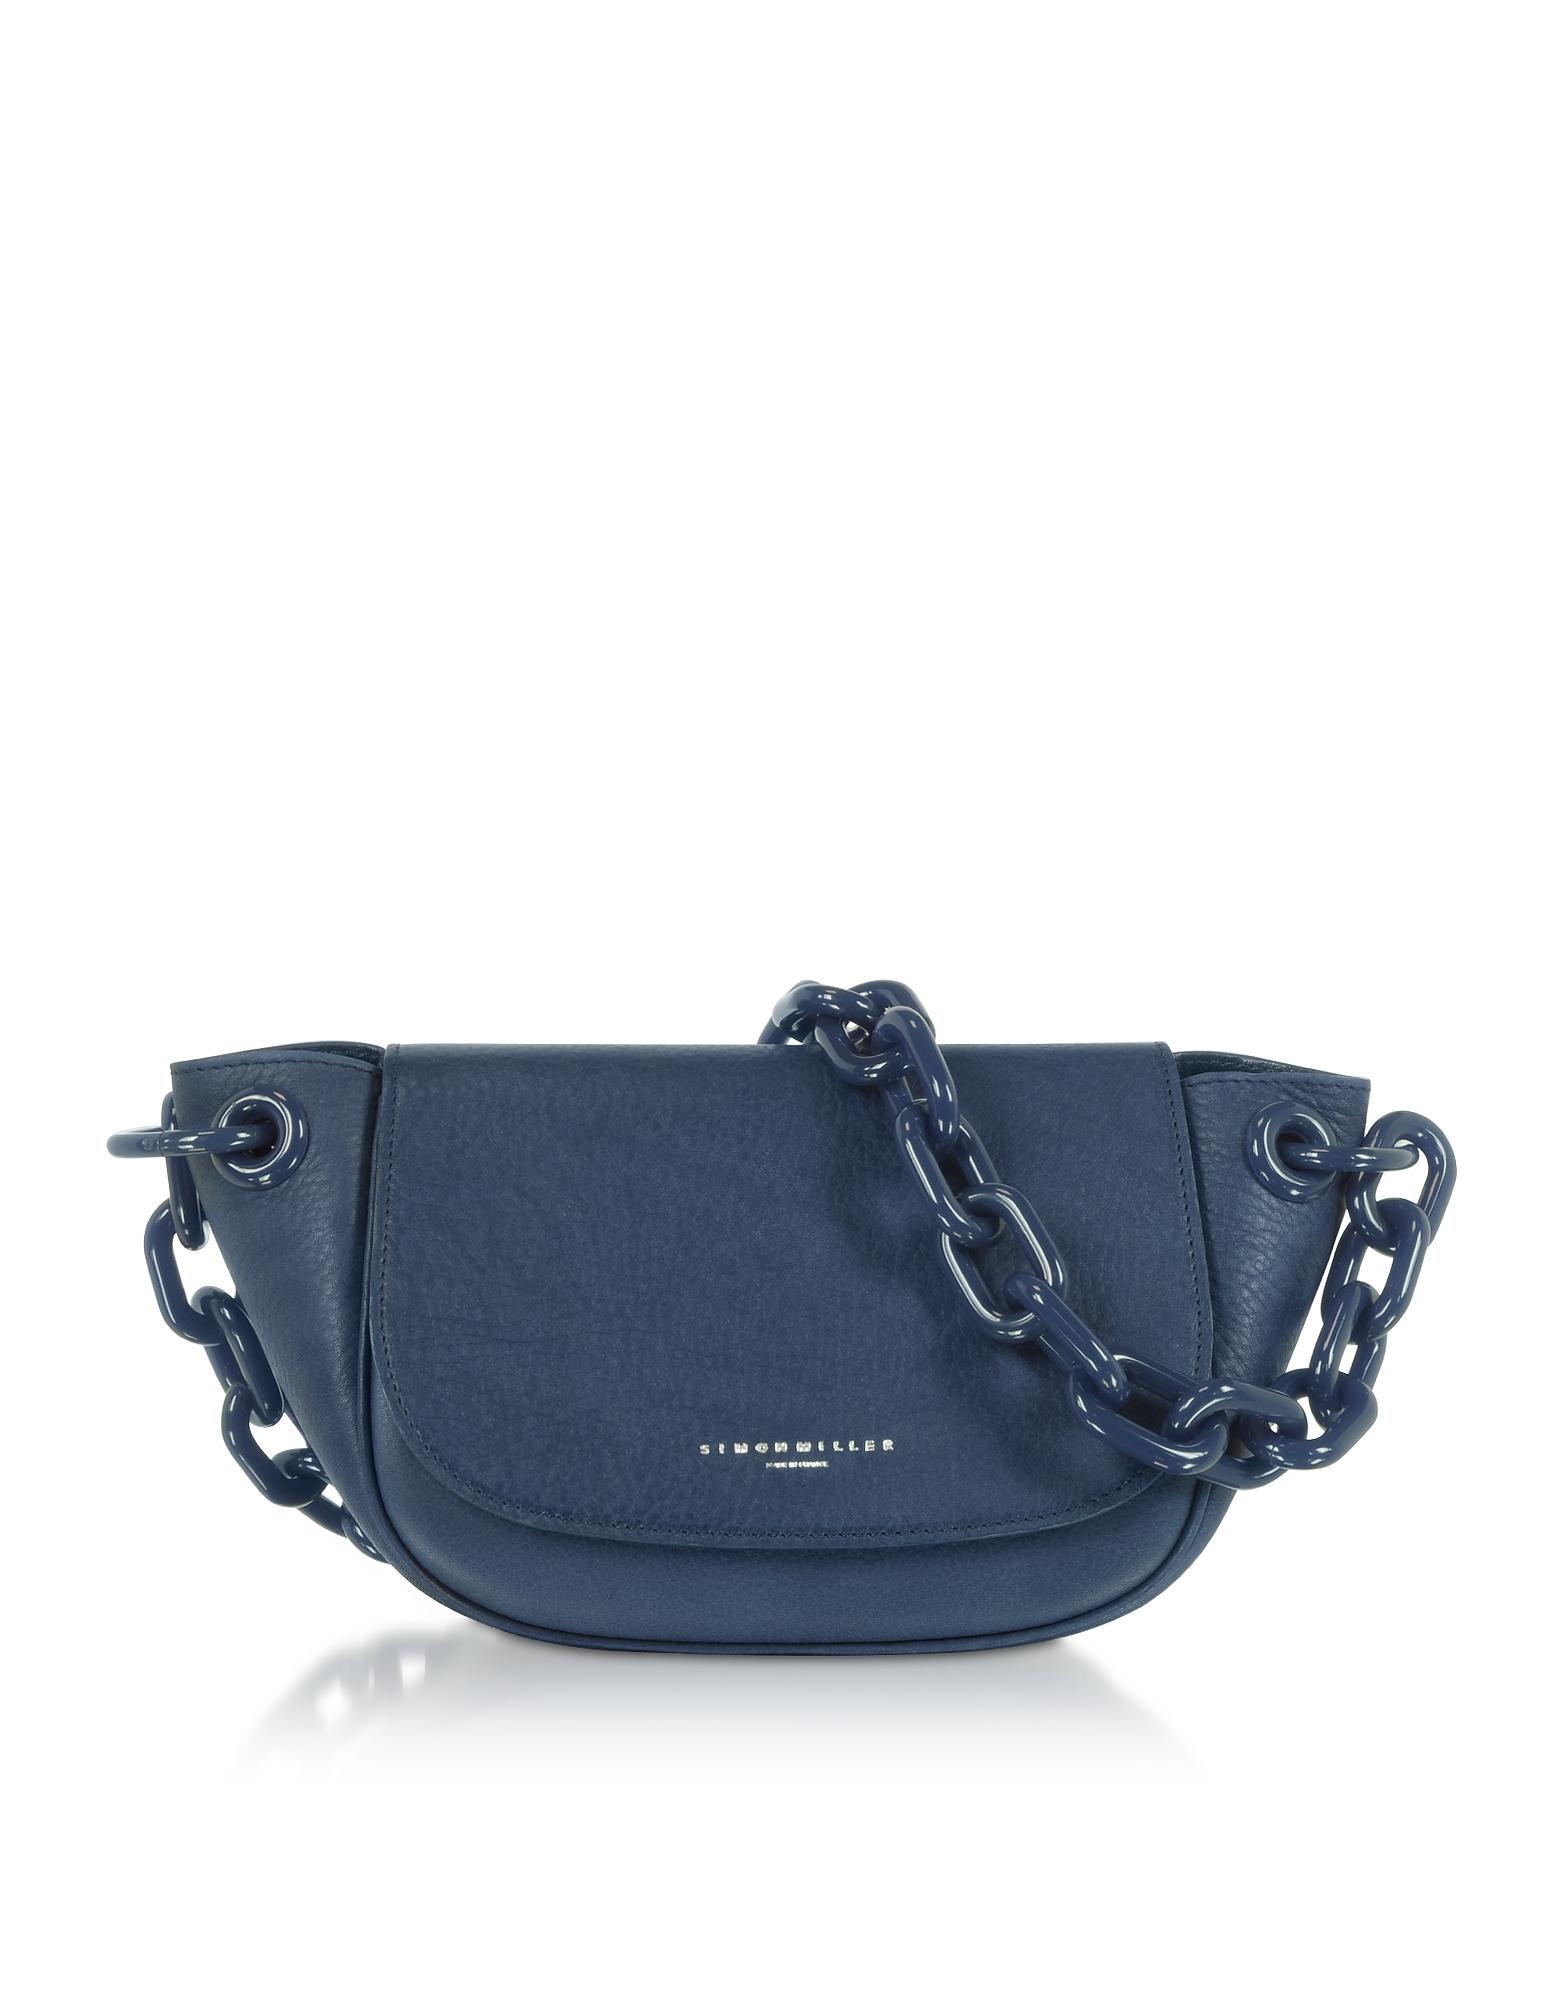 Simon Miller Designer Handbags, Genuine leather Bend Bag